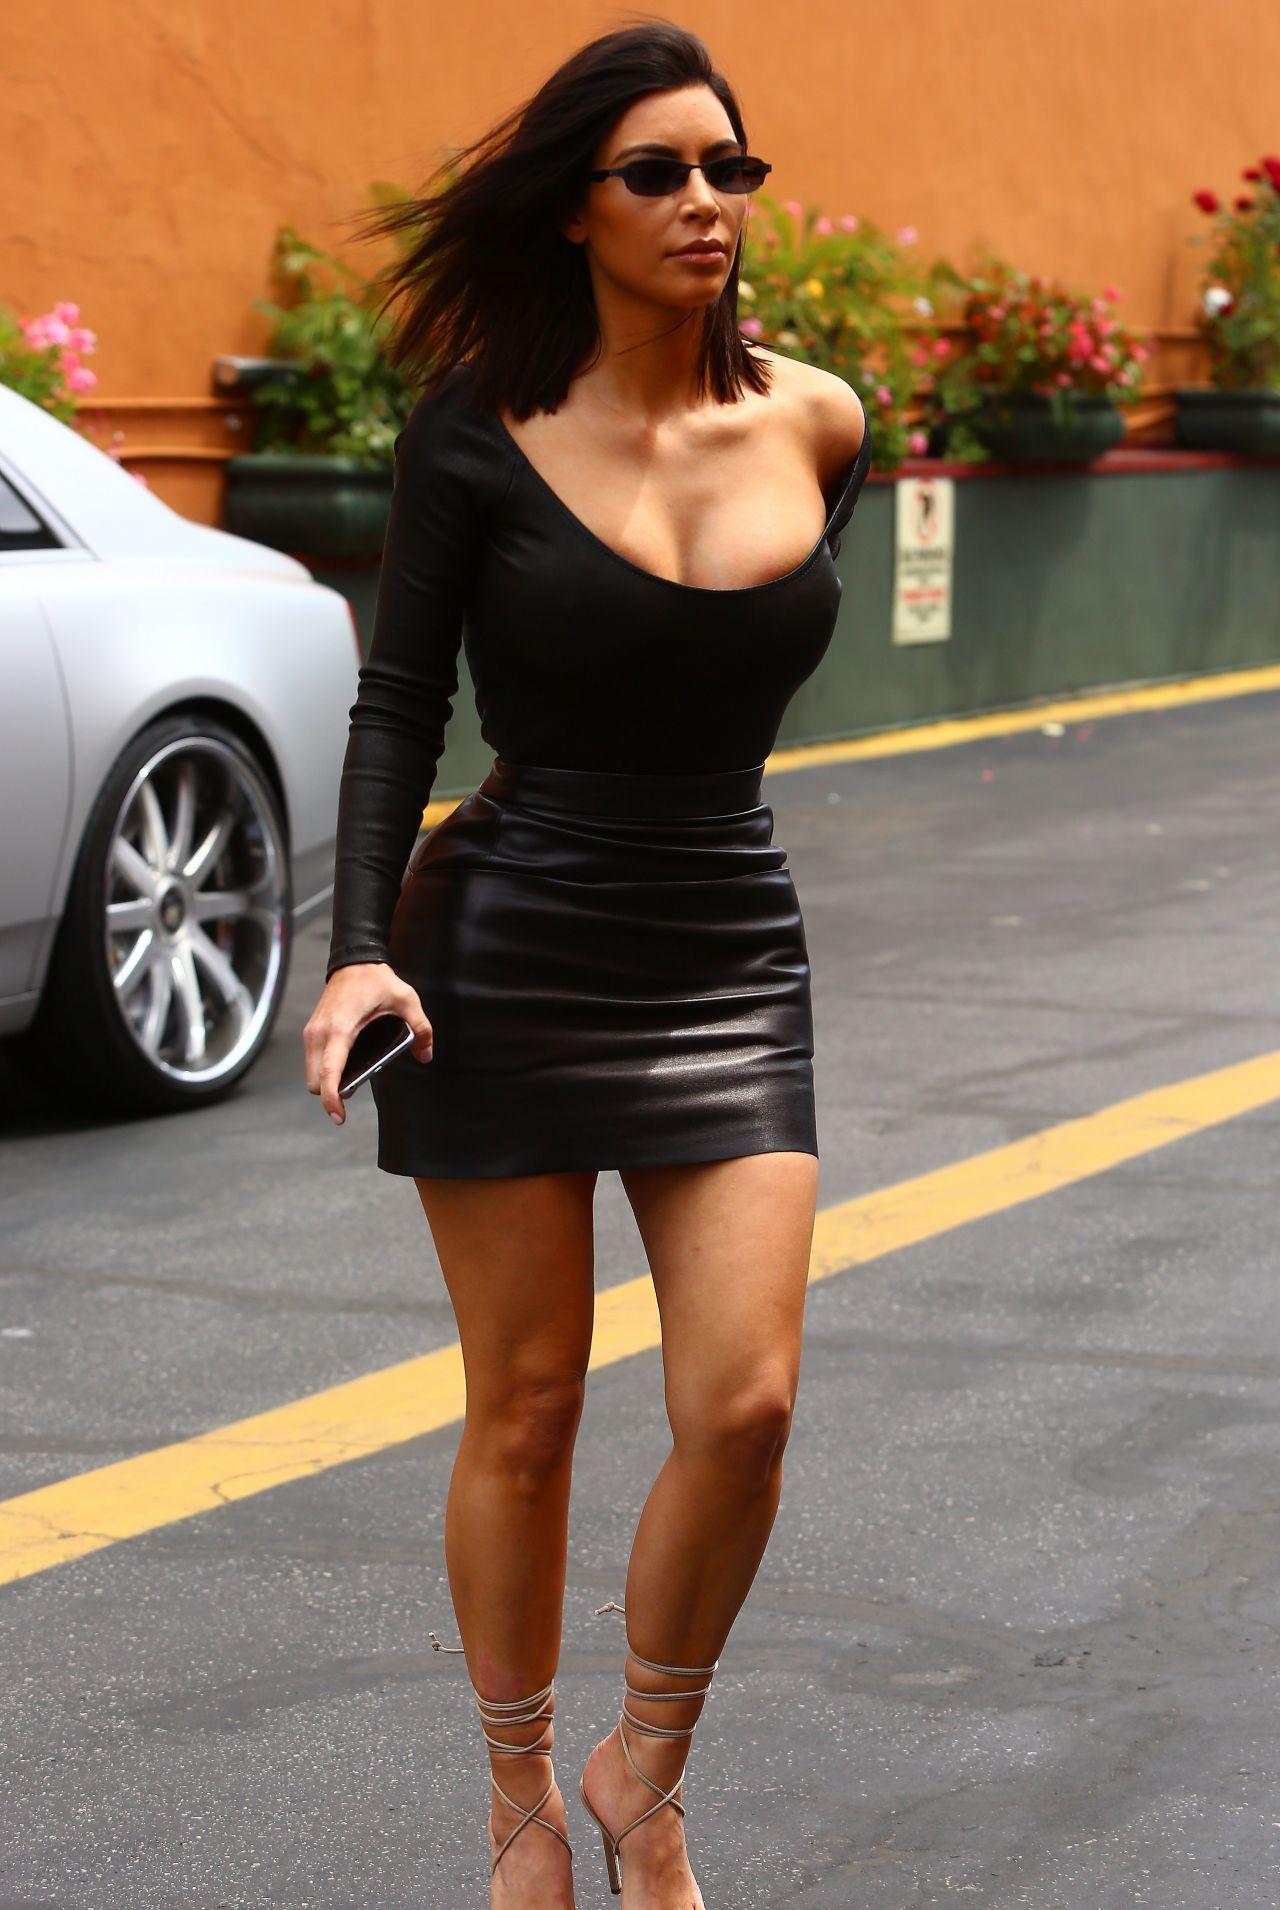 Kim Kardashian in Skintight Black Outfit